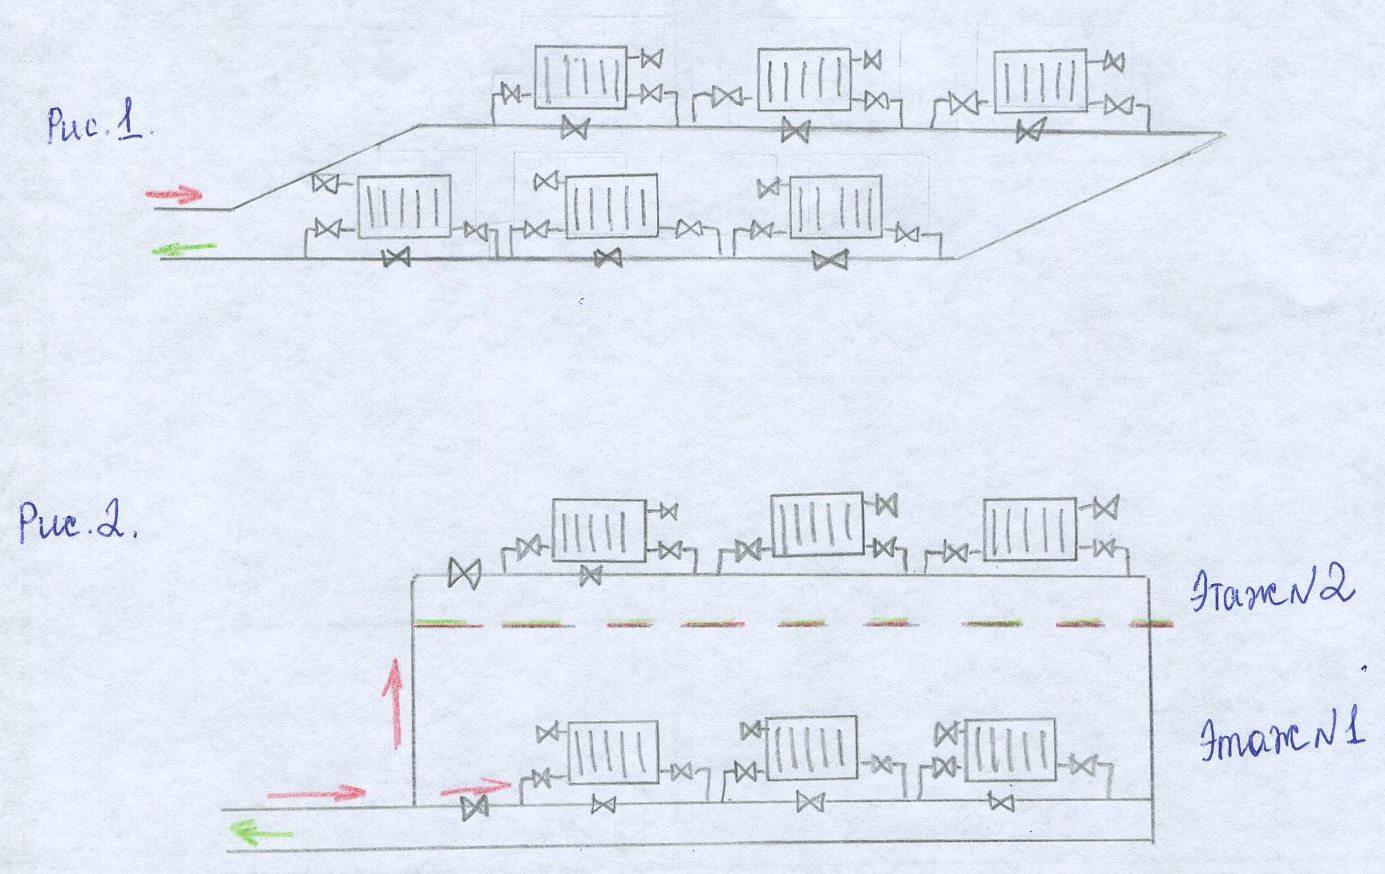 Схема однотрубного отопления частного дома фото 834